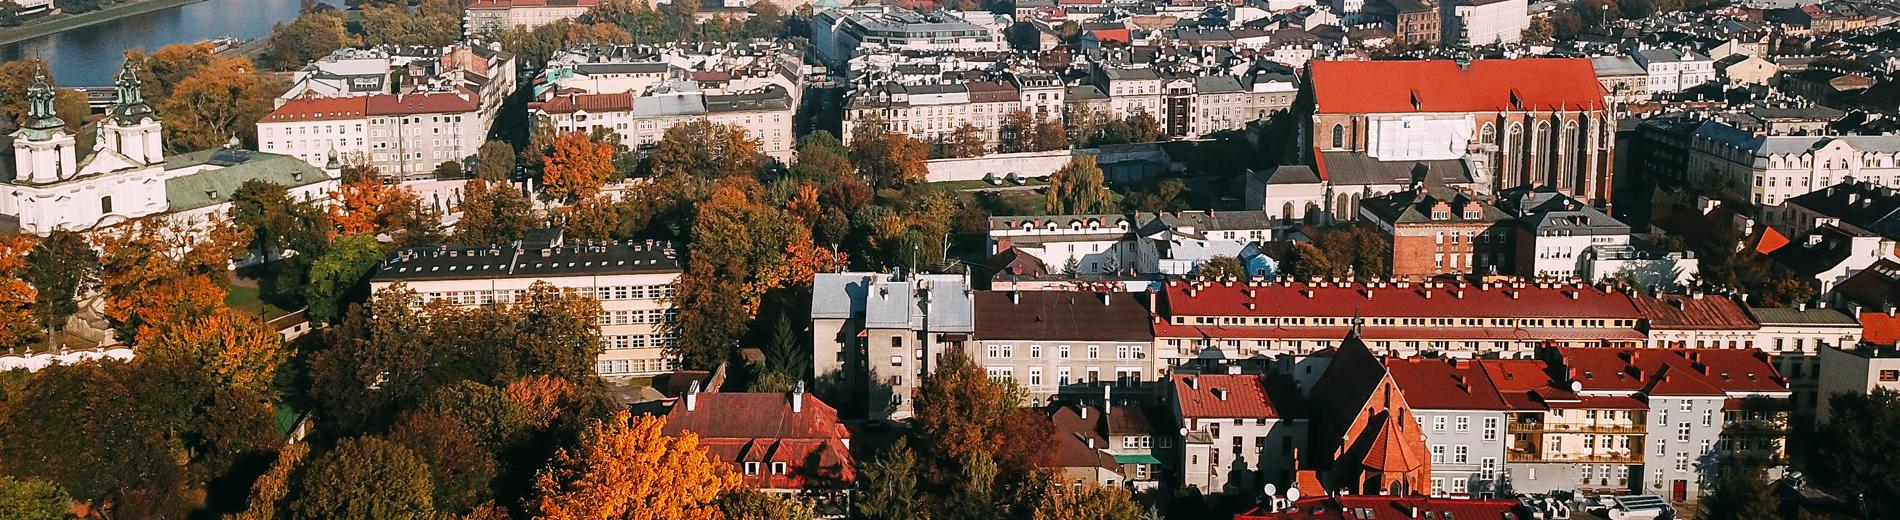 Krakow-panorama